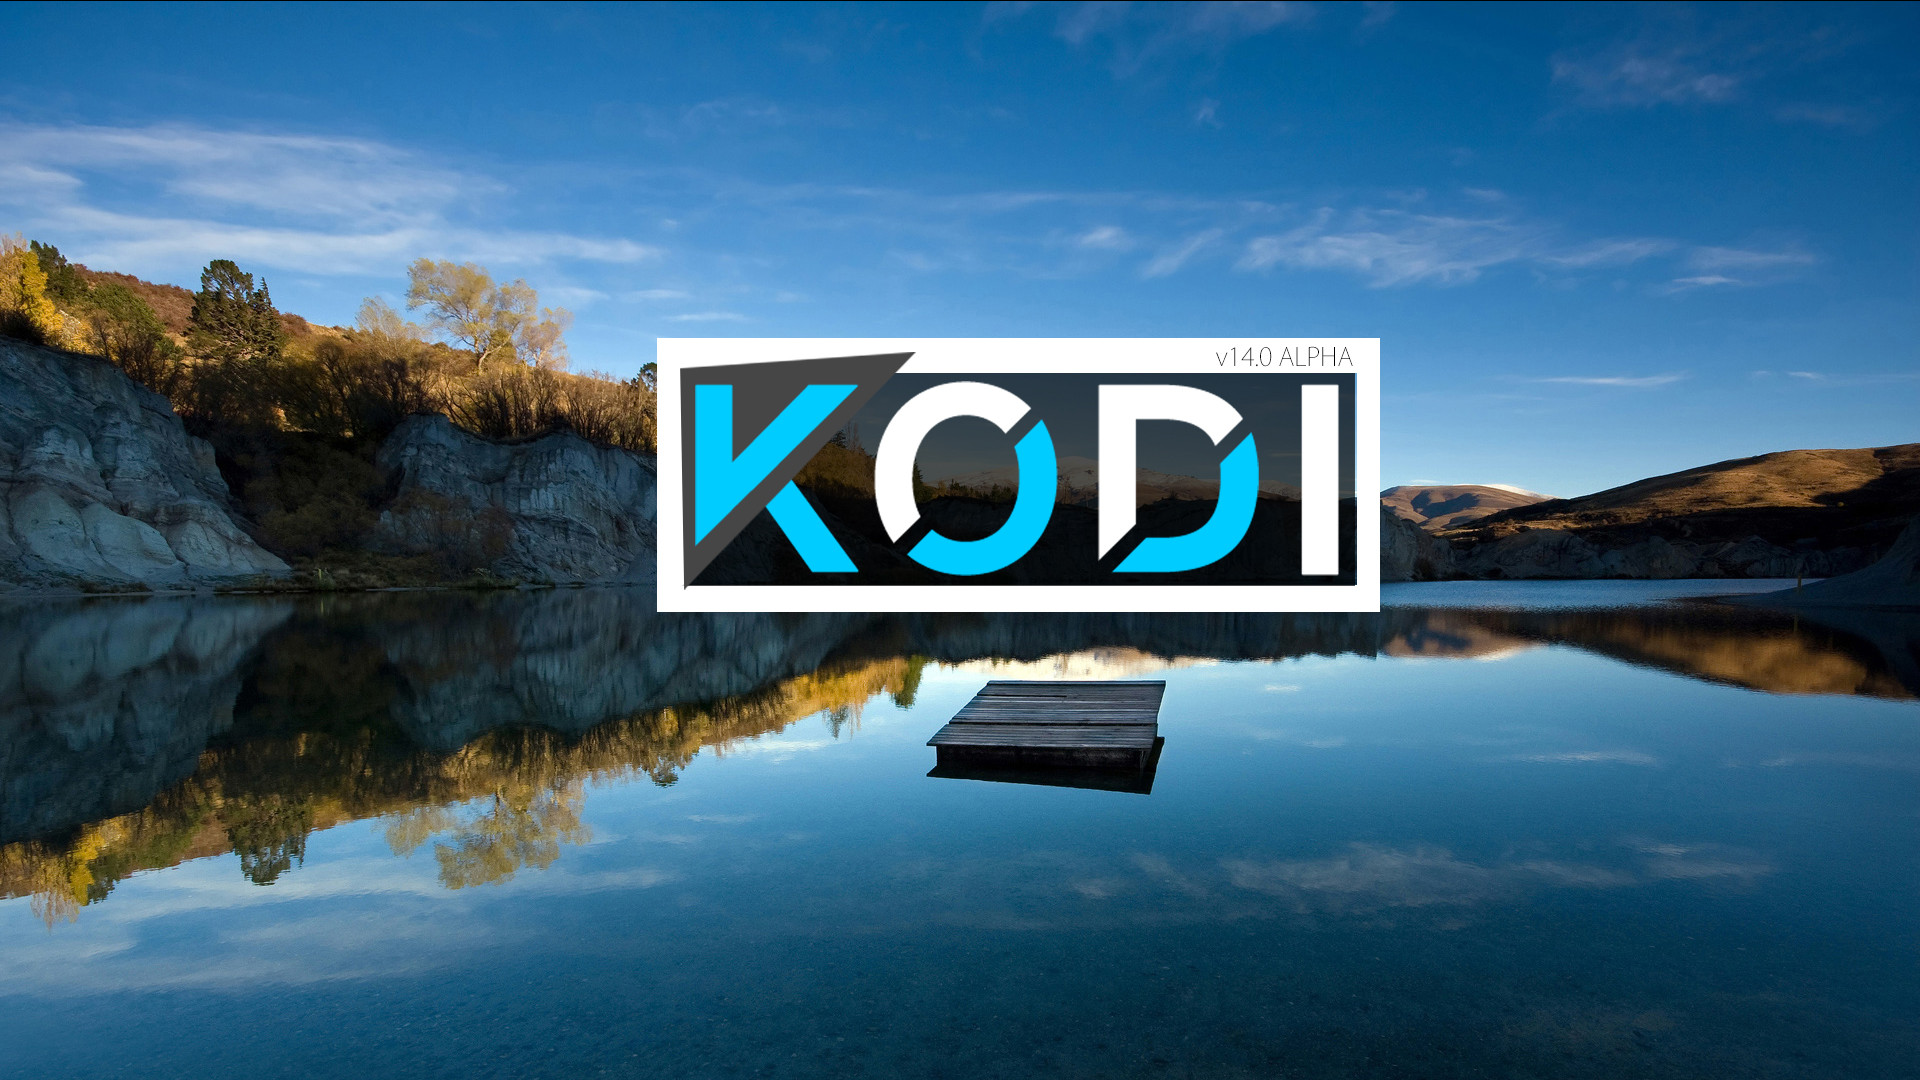 Wallpaper download kodi - Kodi Wallpaper Related Keywords Suggestions Kodi Wallpaper Long